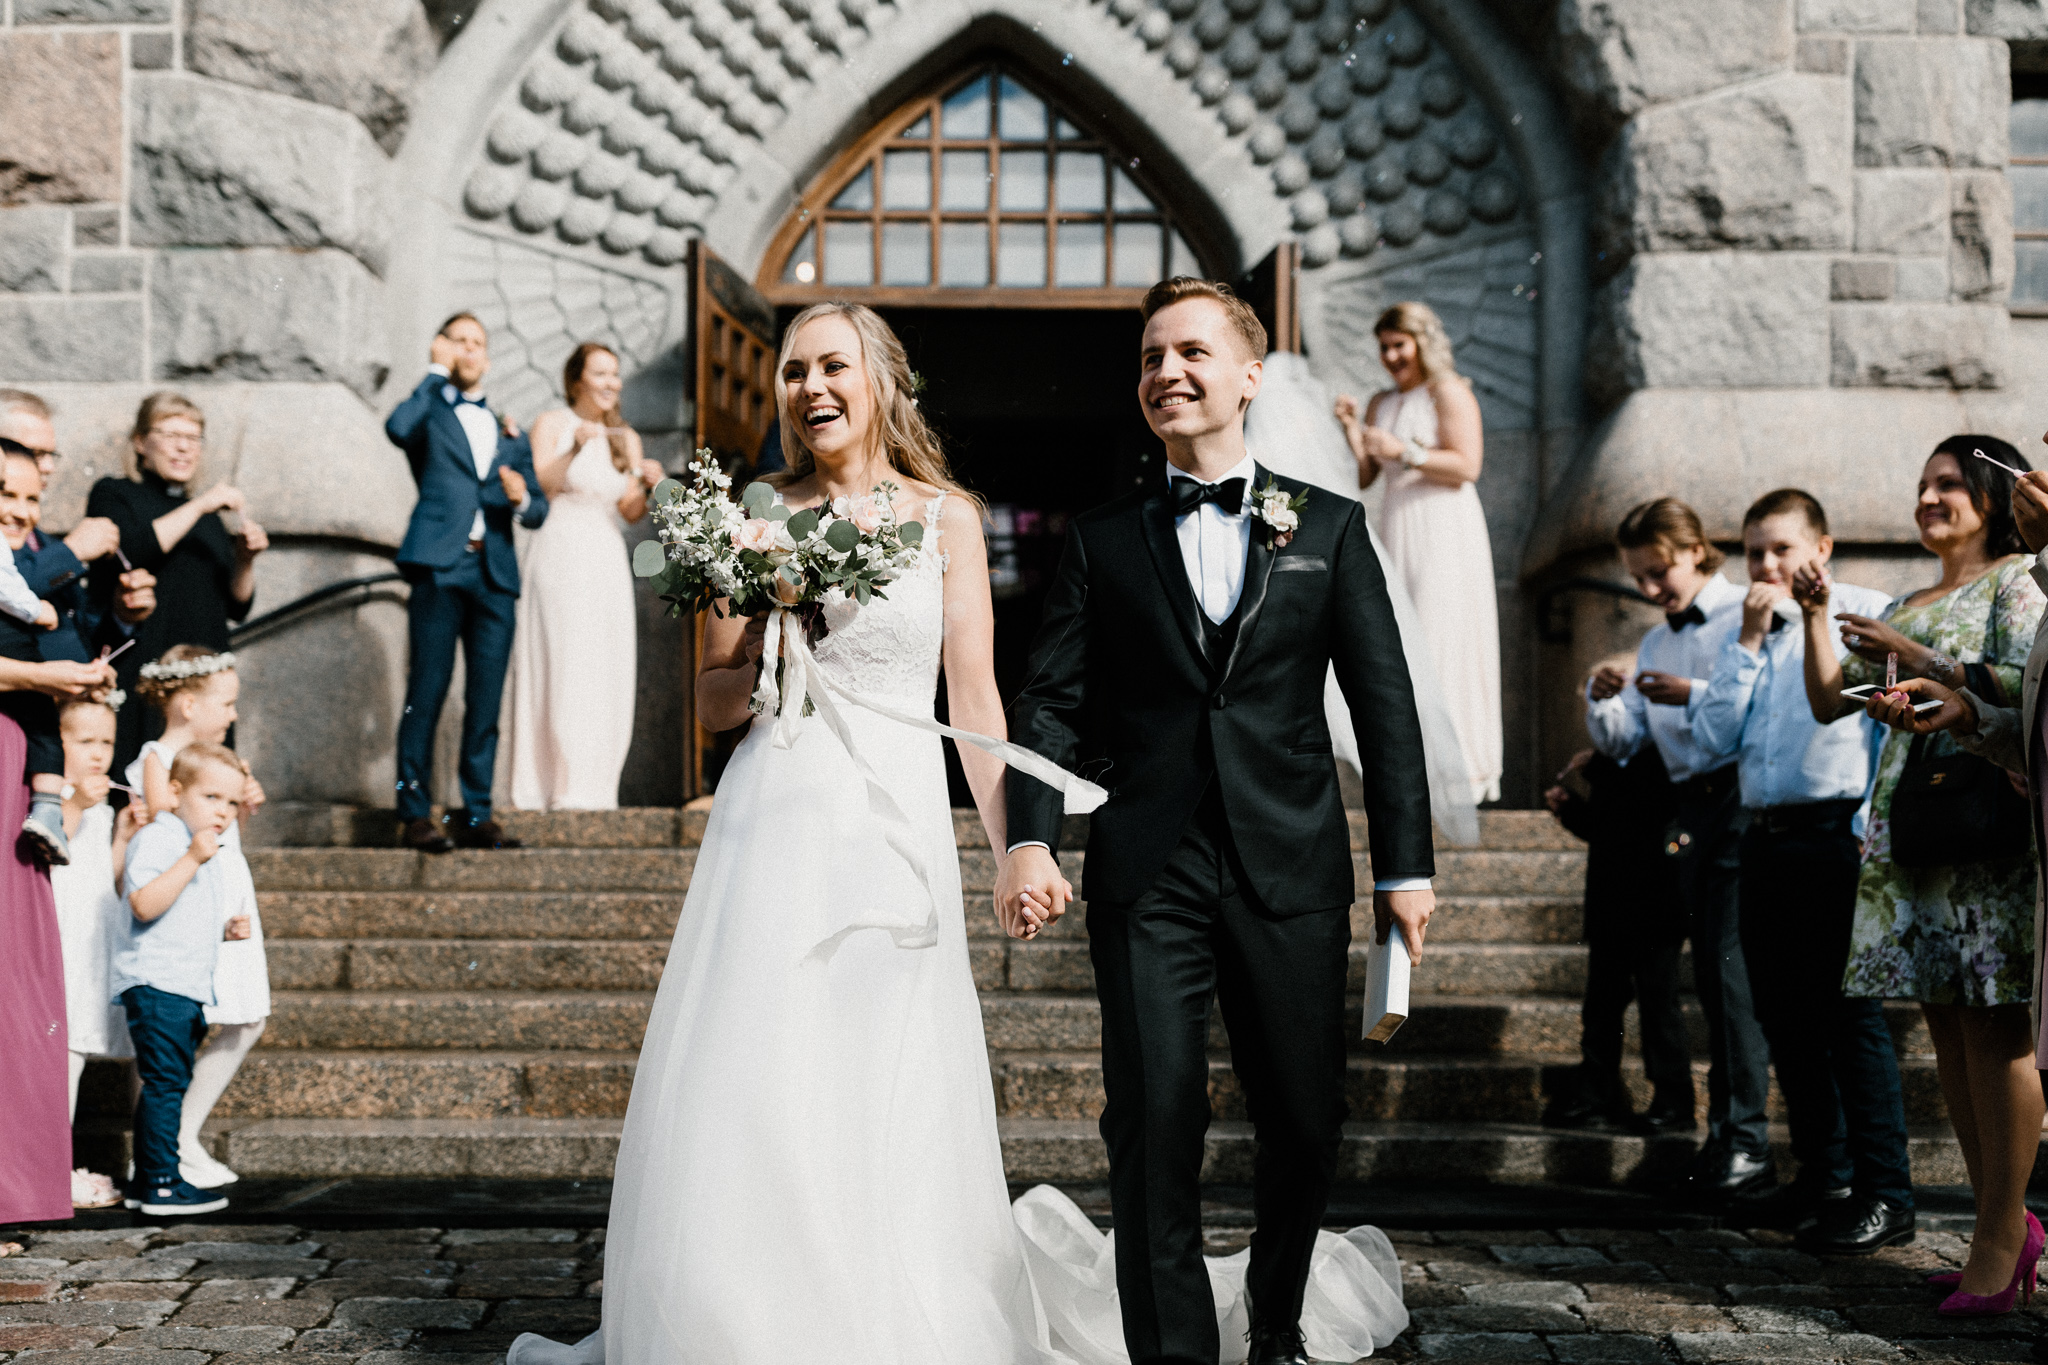 Johanna + Mikko - Tampere - Photo by Patrick Karkkolainen Wedding Photographer-83.jpg